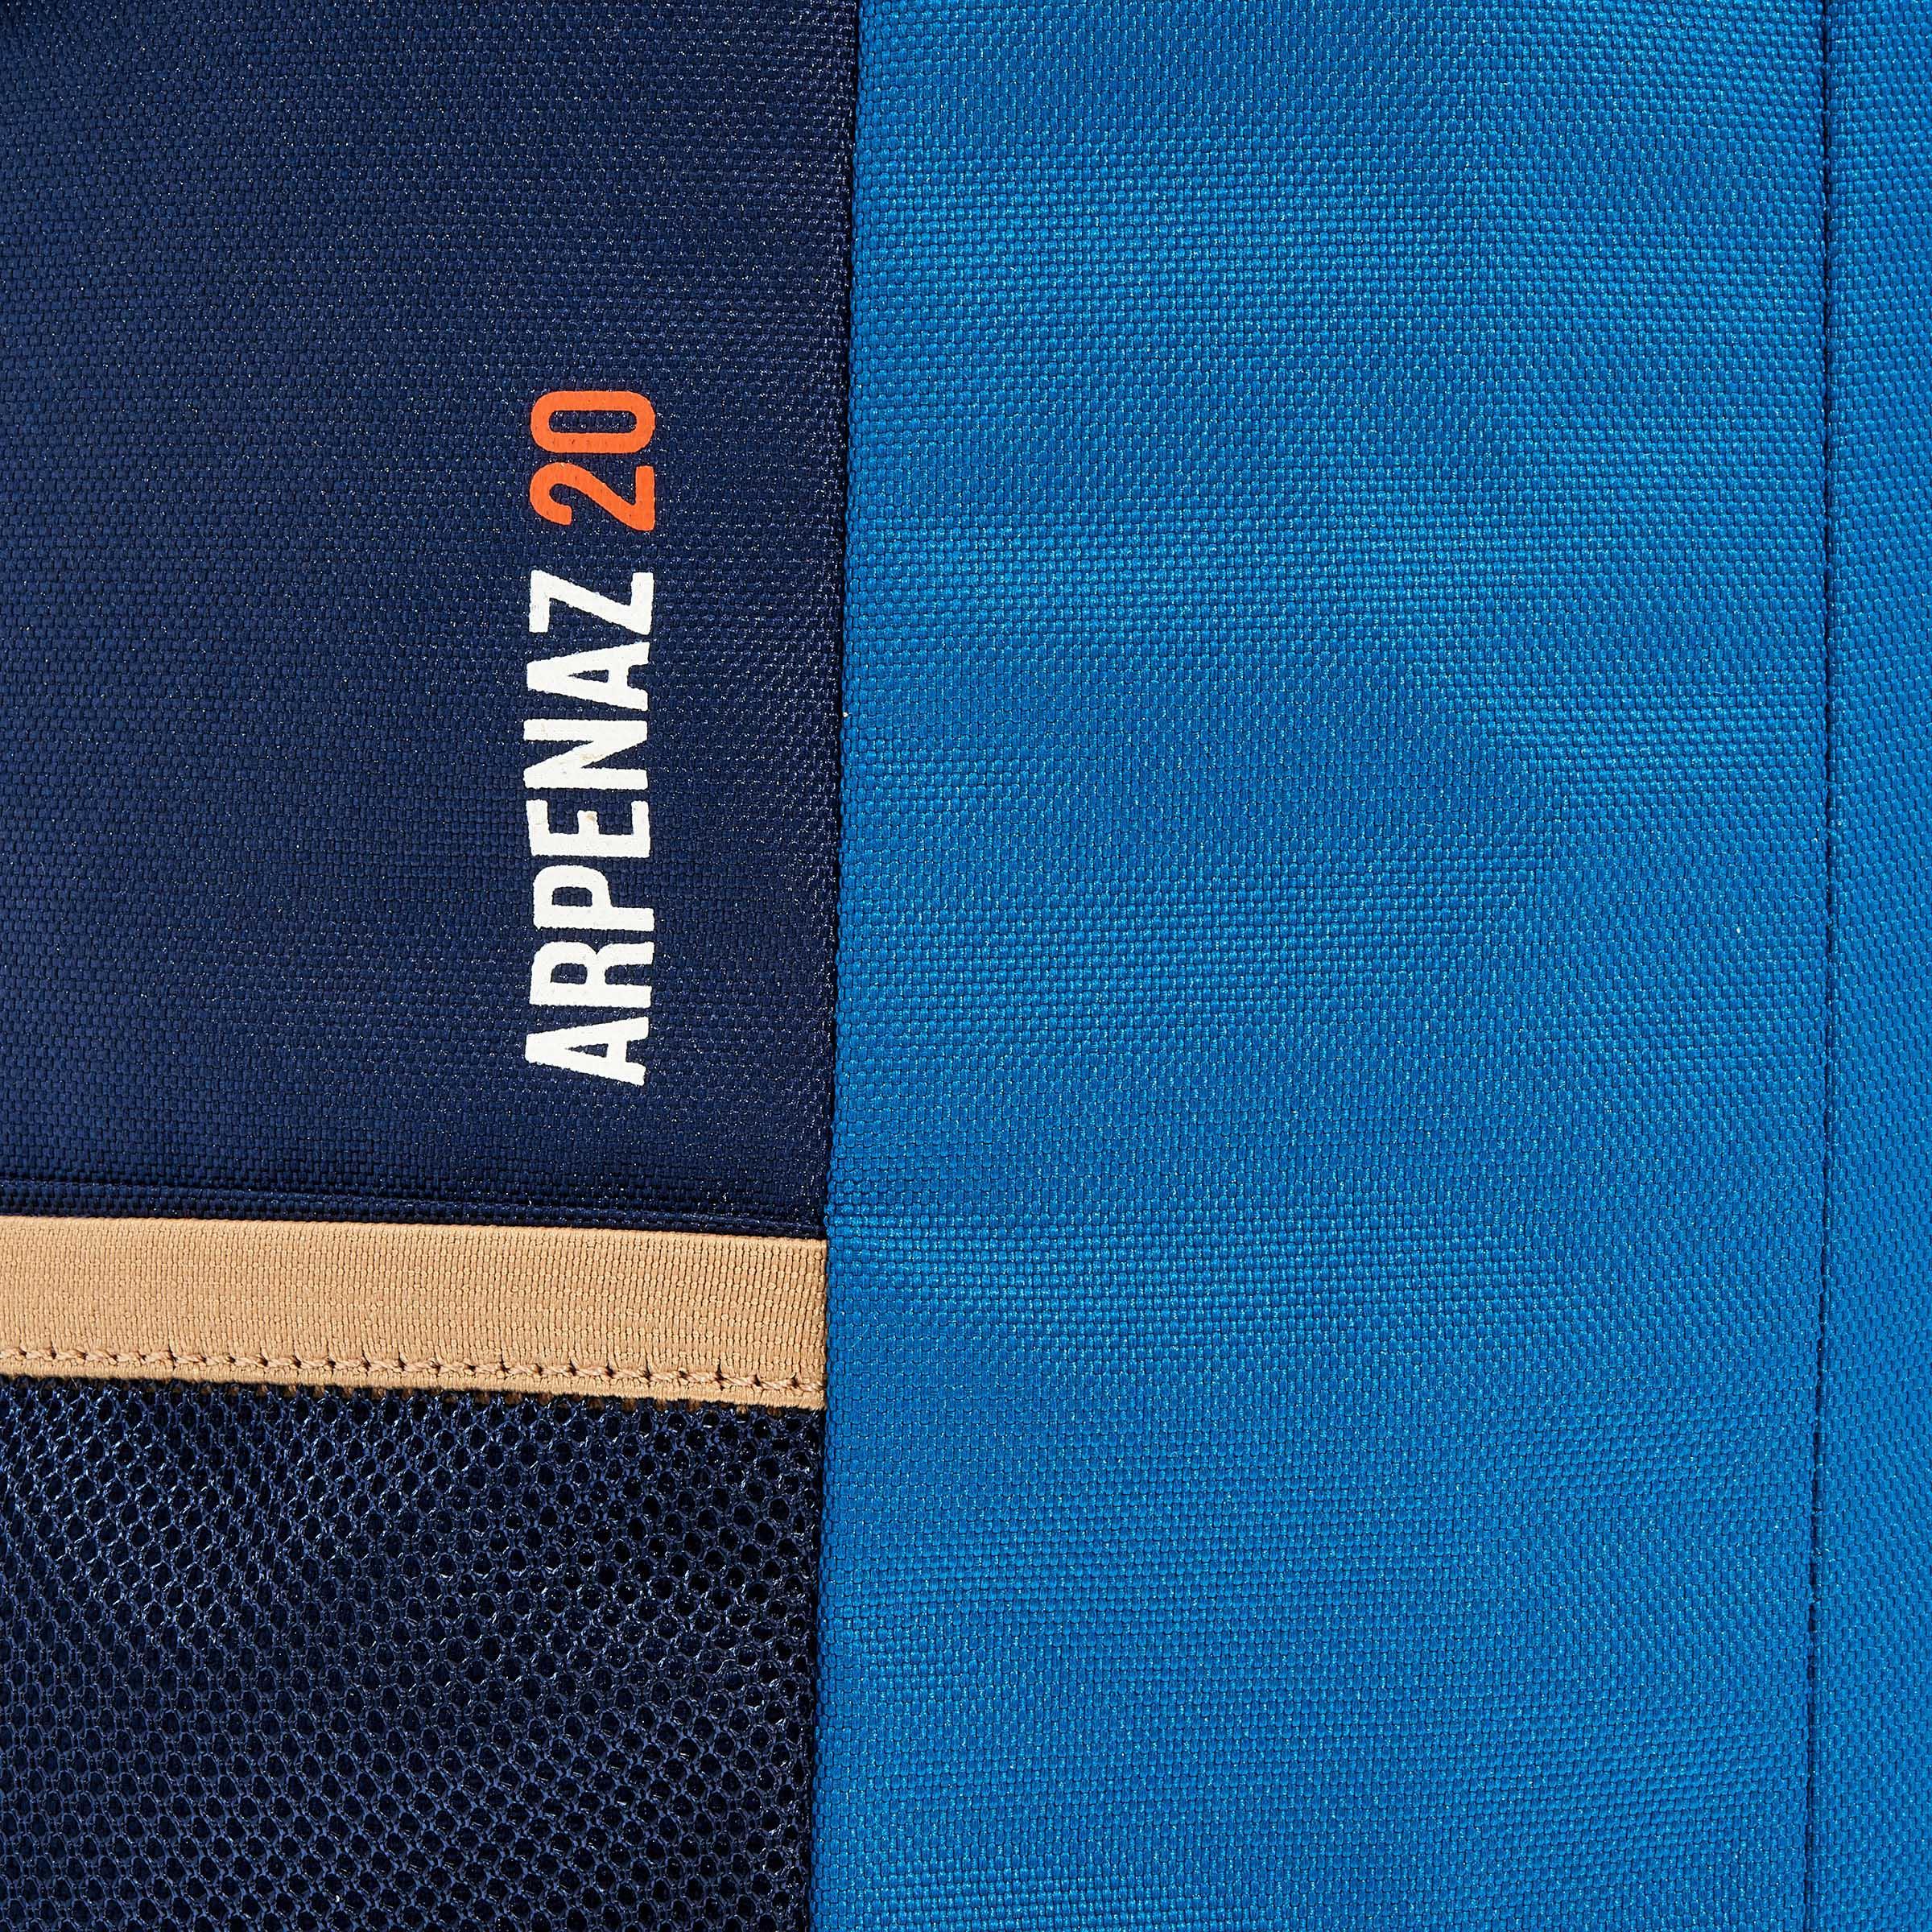 HIKING BACKPACK 20 Litre NH100 - BEIGE/BLUE